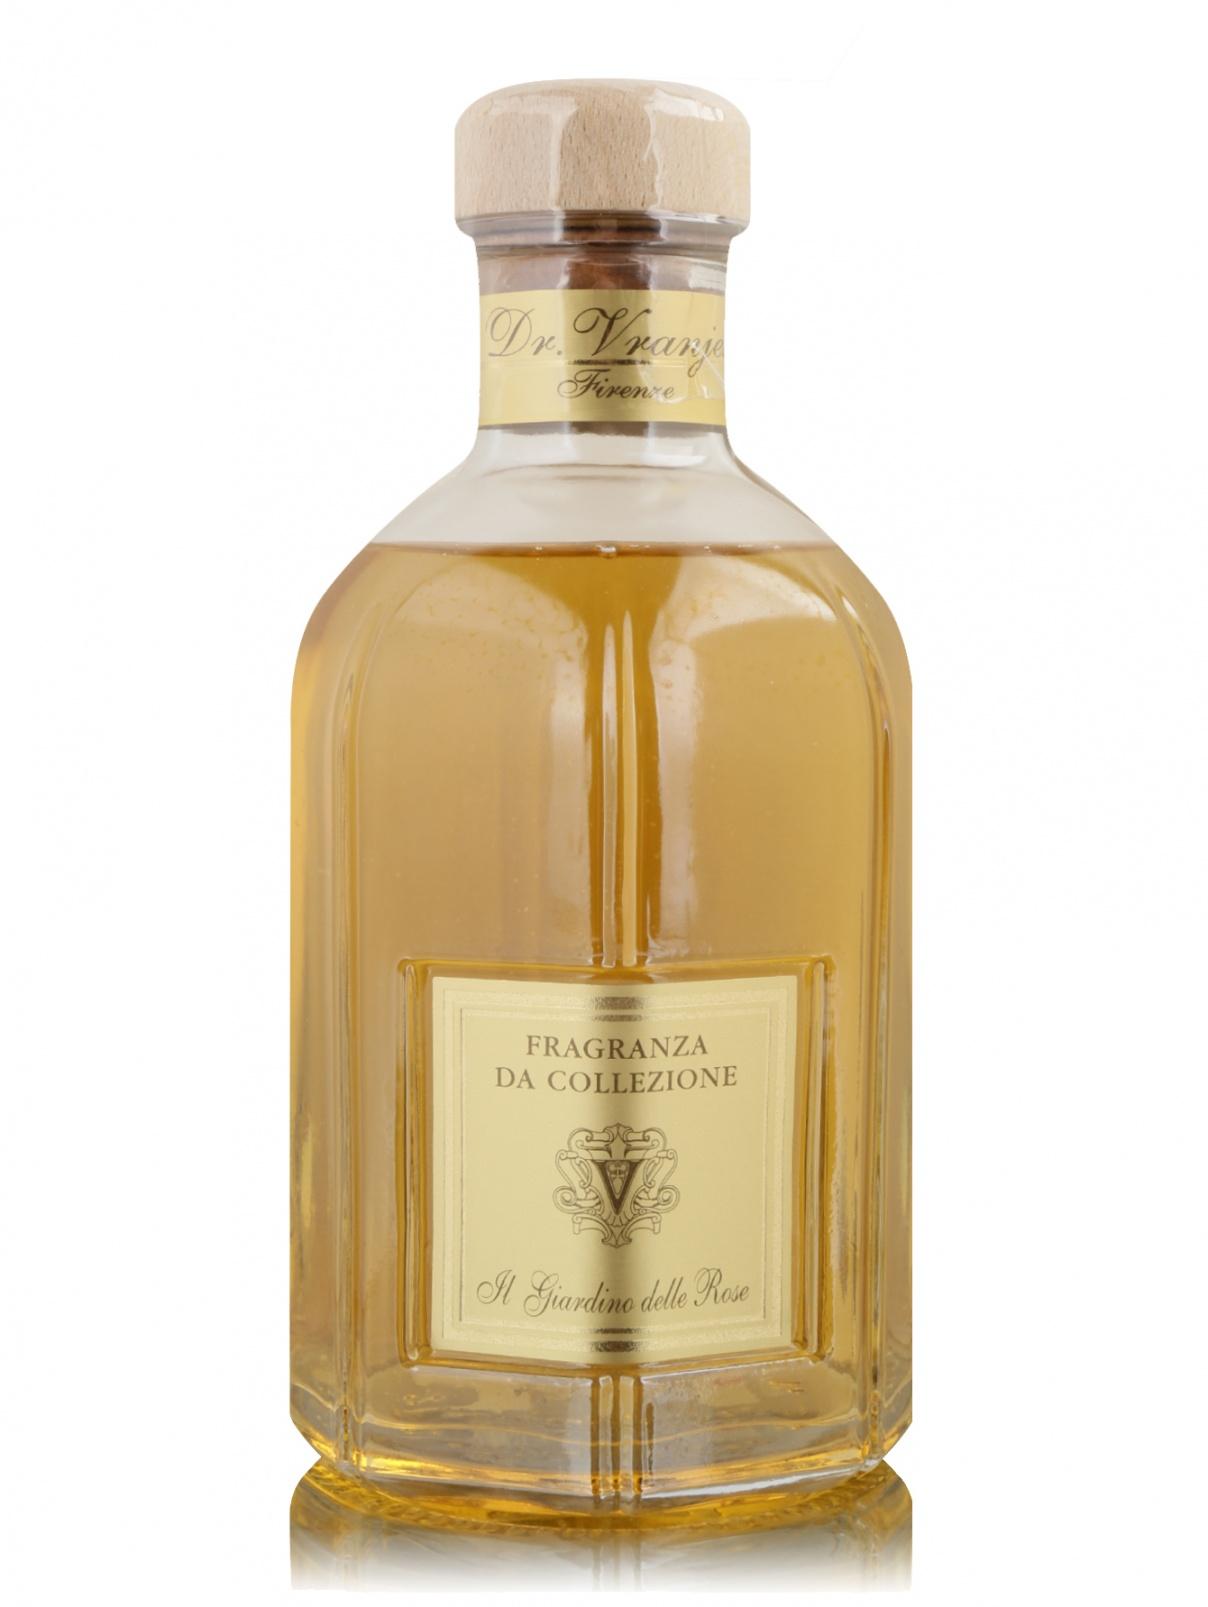 Ароматизатор воздуха Giardino delle Rose, 500 мл Home Fragrance Dr. Vranjes  –  Общий вид